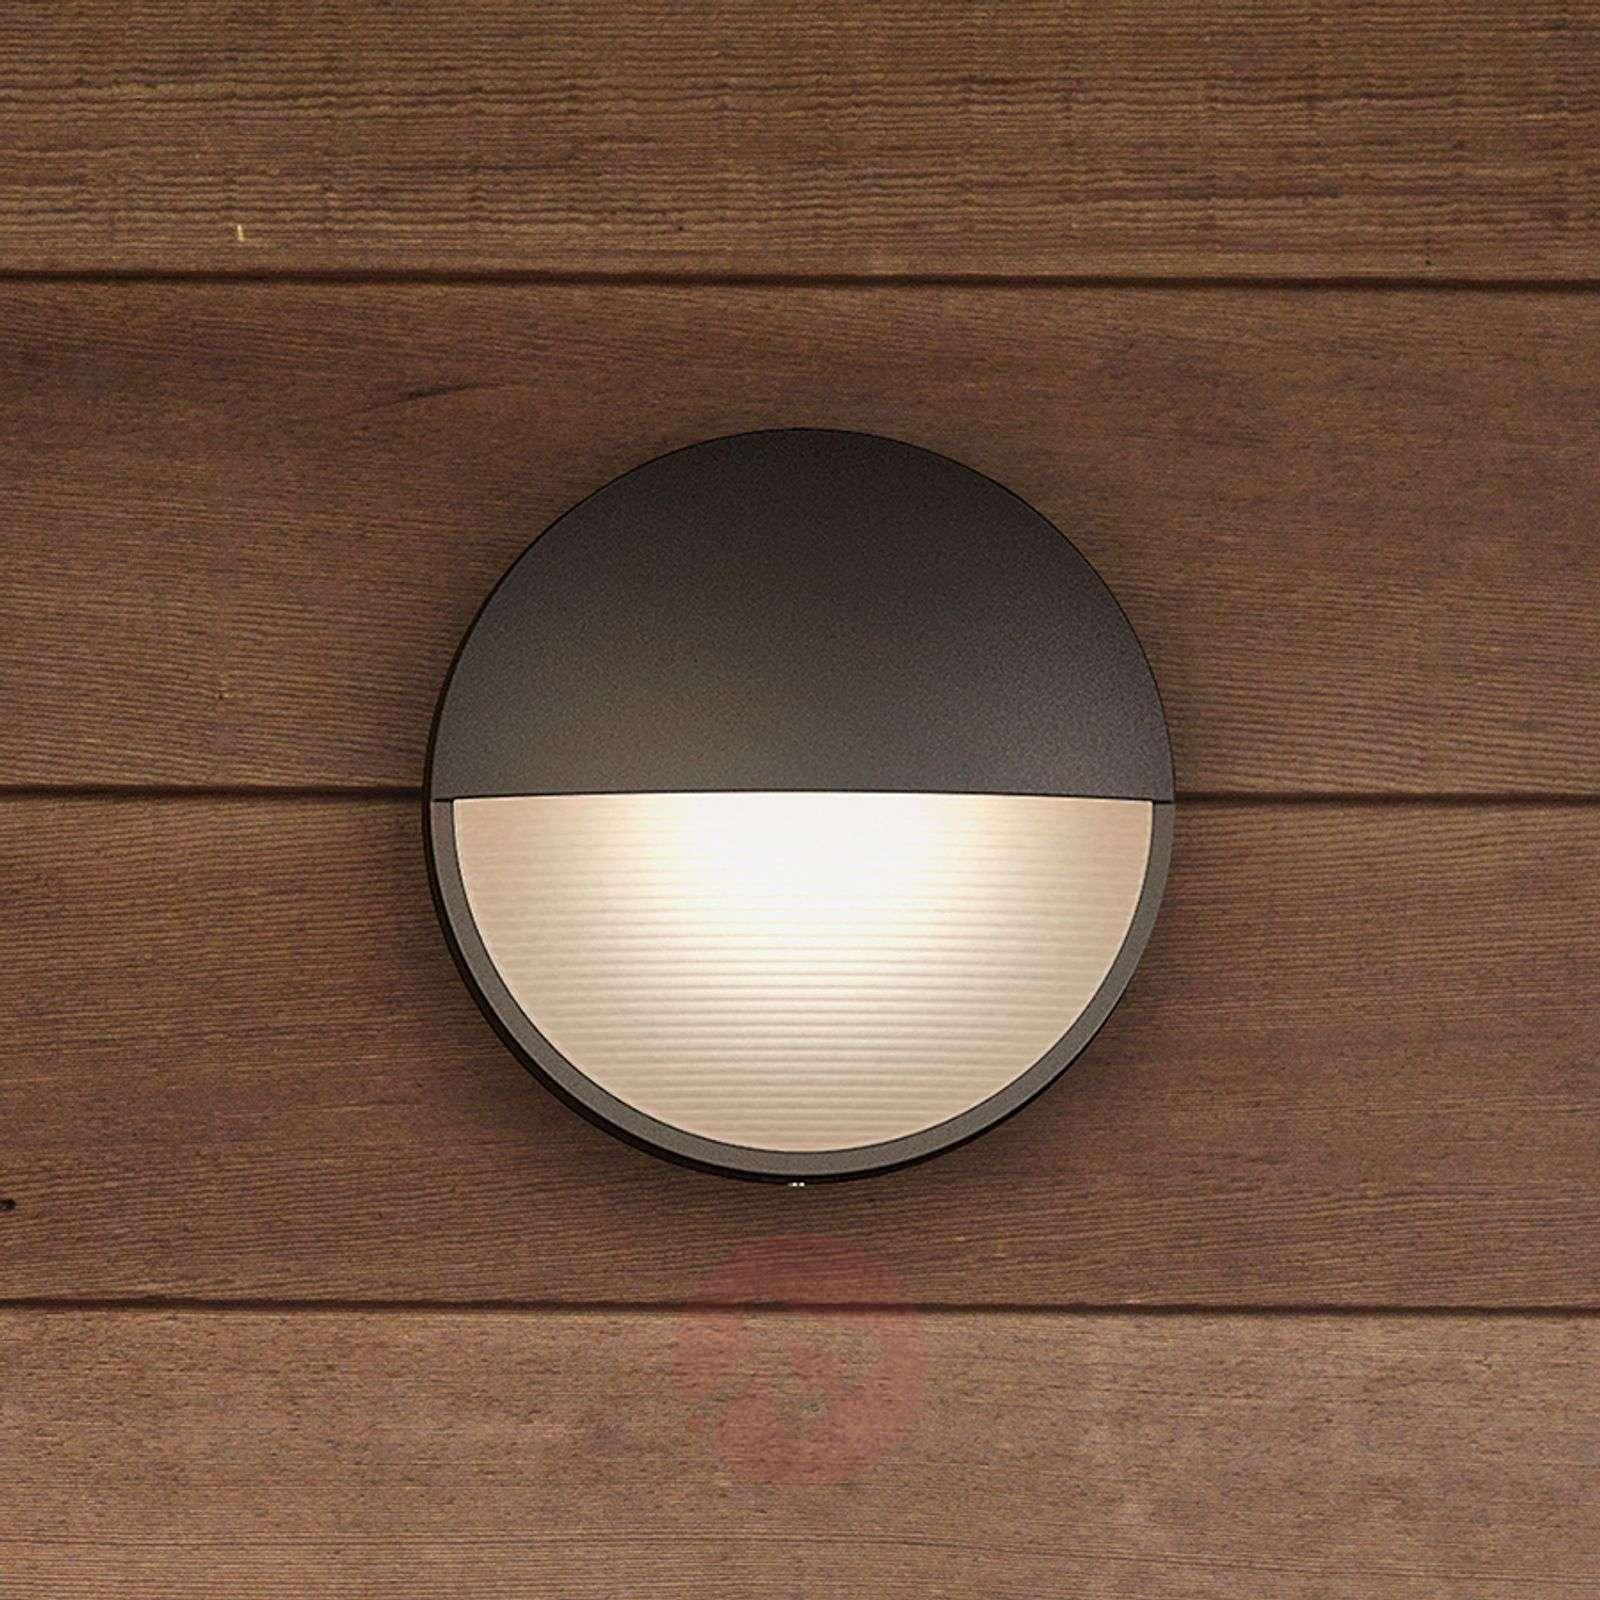 Capricorn anthracite-coloured LED wall light, IP44-7531784-02